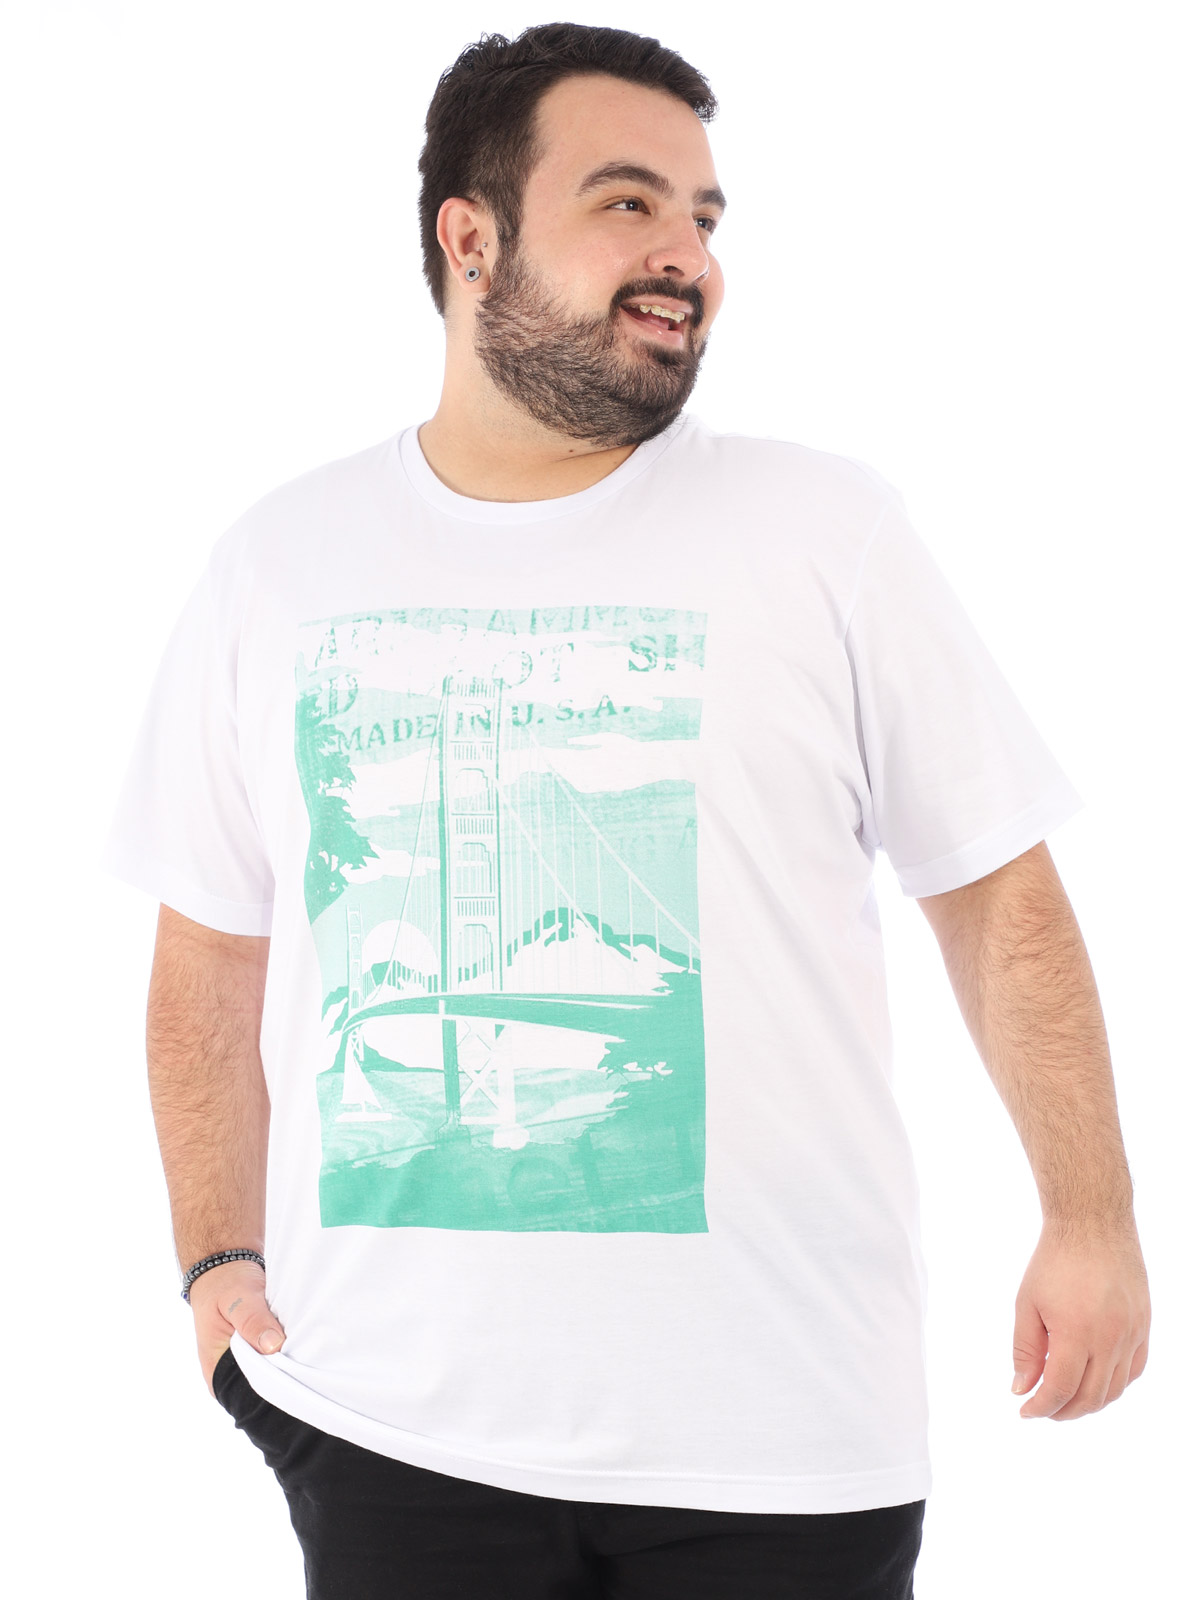 Camiseta Plus Size Masculina Algodão Manga Curta Ponte Branco